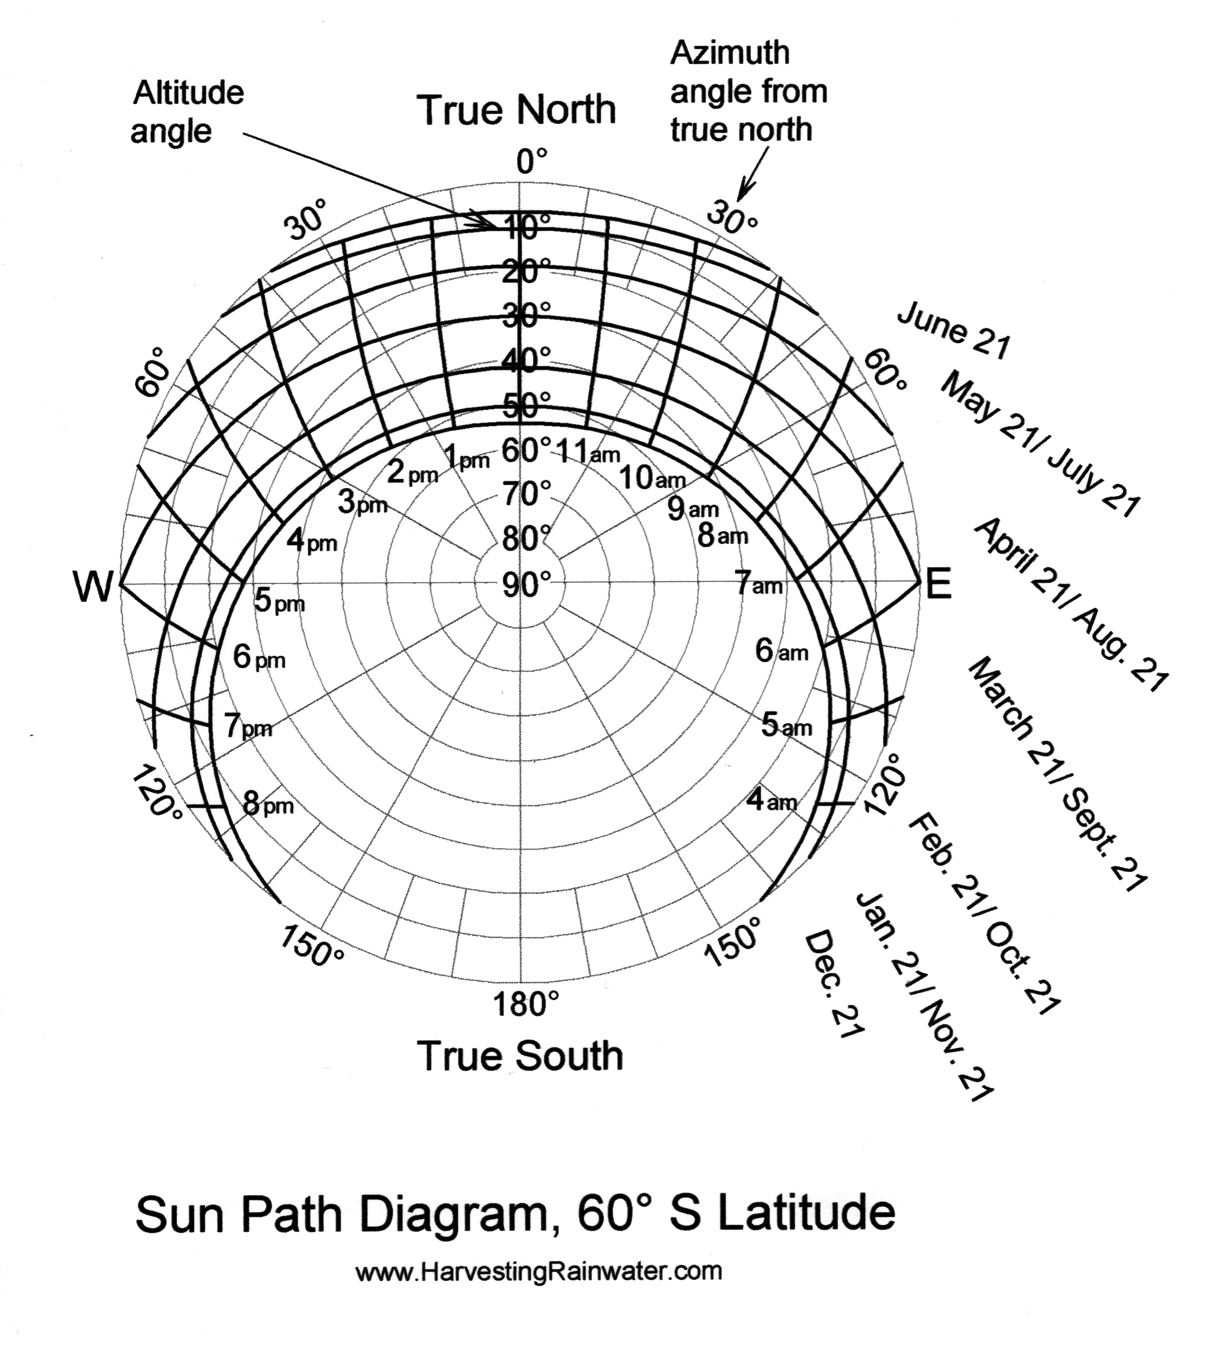 Sun Path Diagram 60o S Latitude